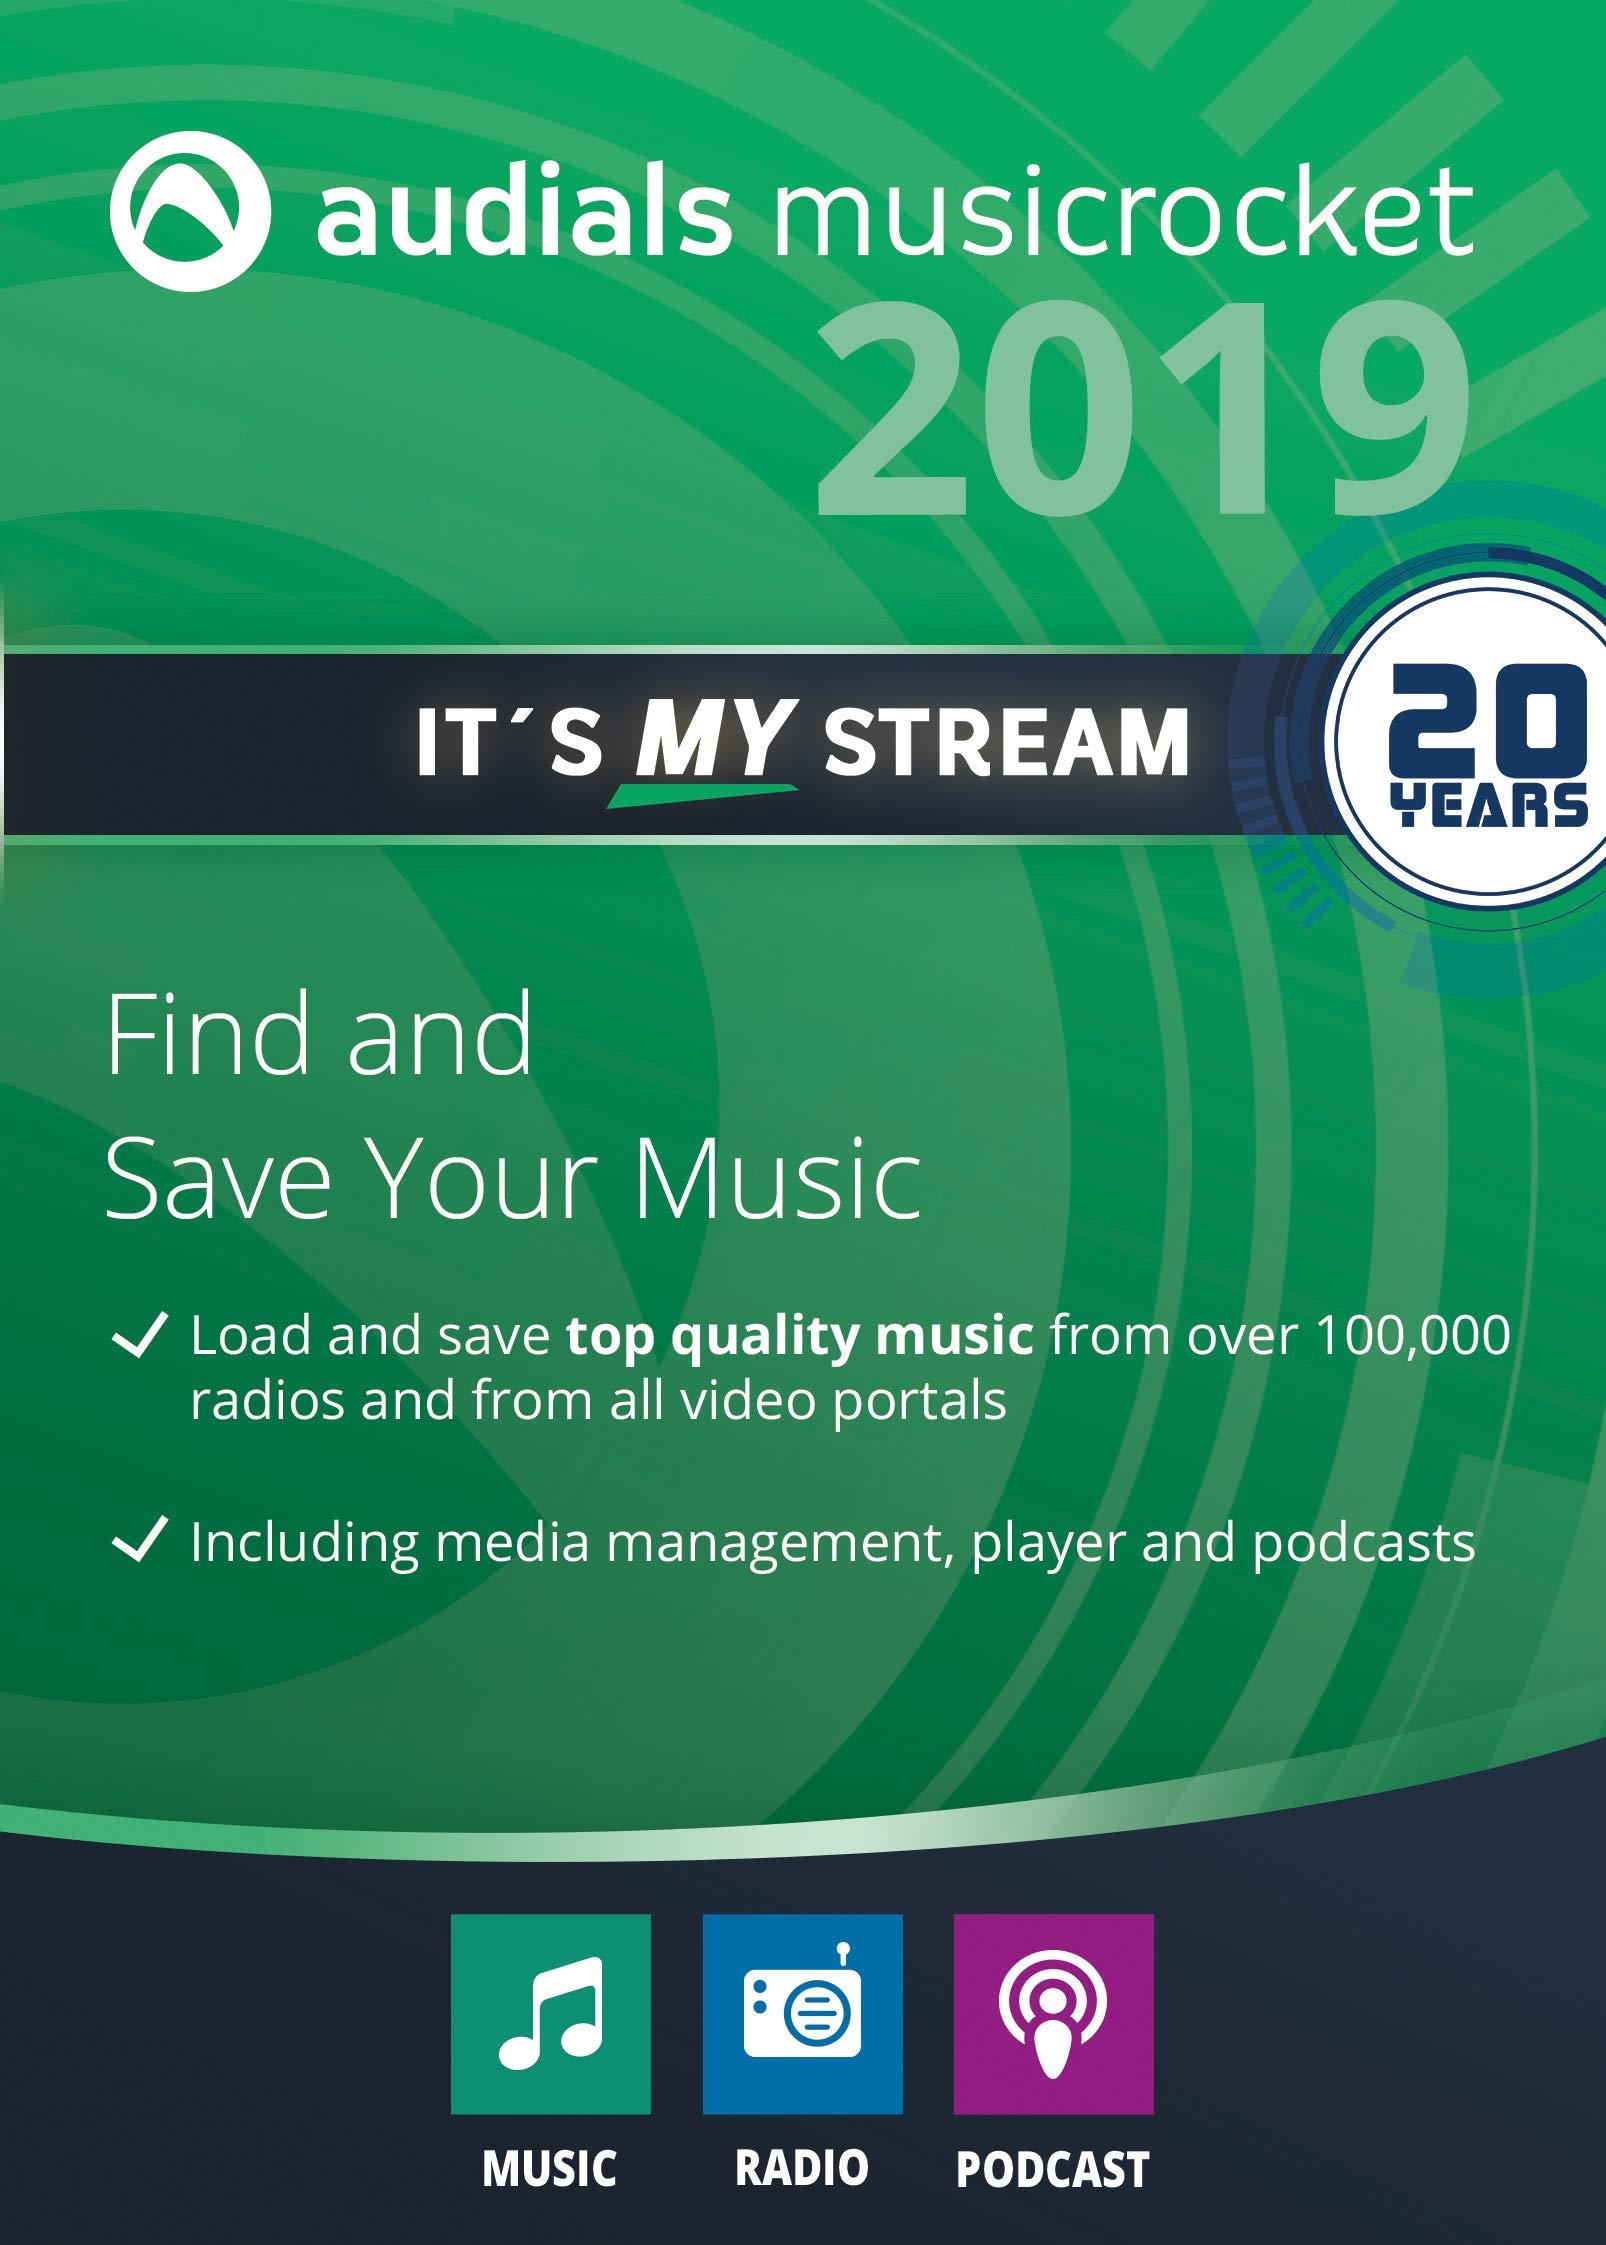 Audials Music Rocket 2019 [PC Download]